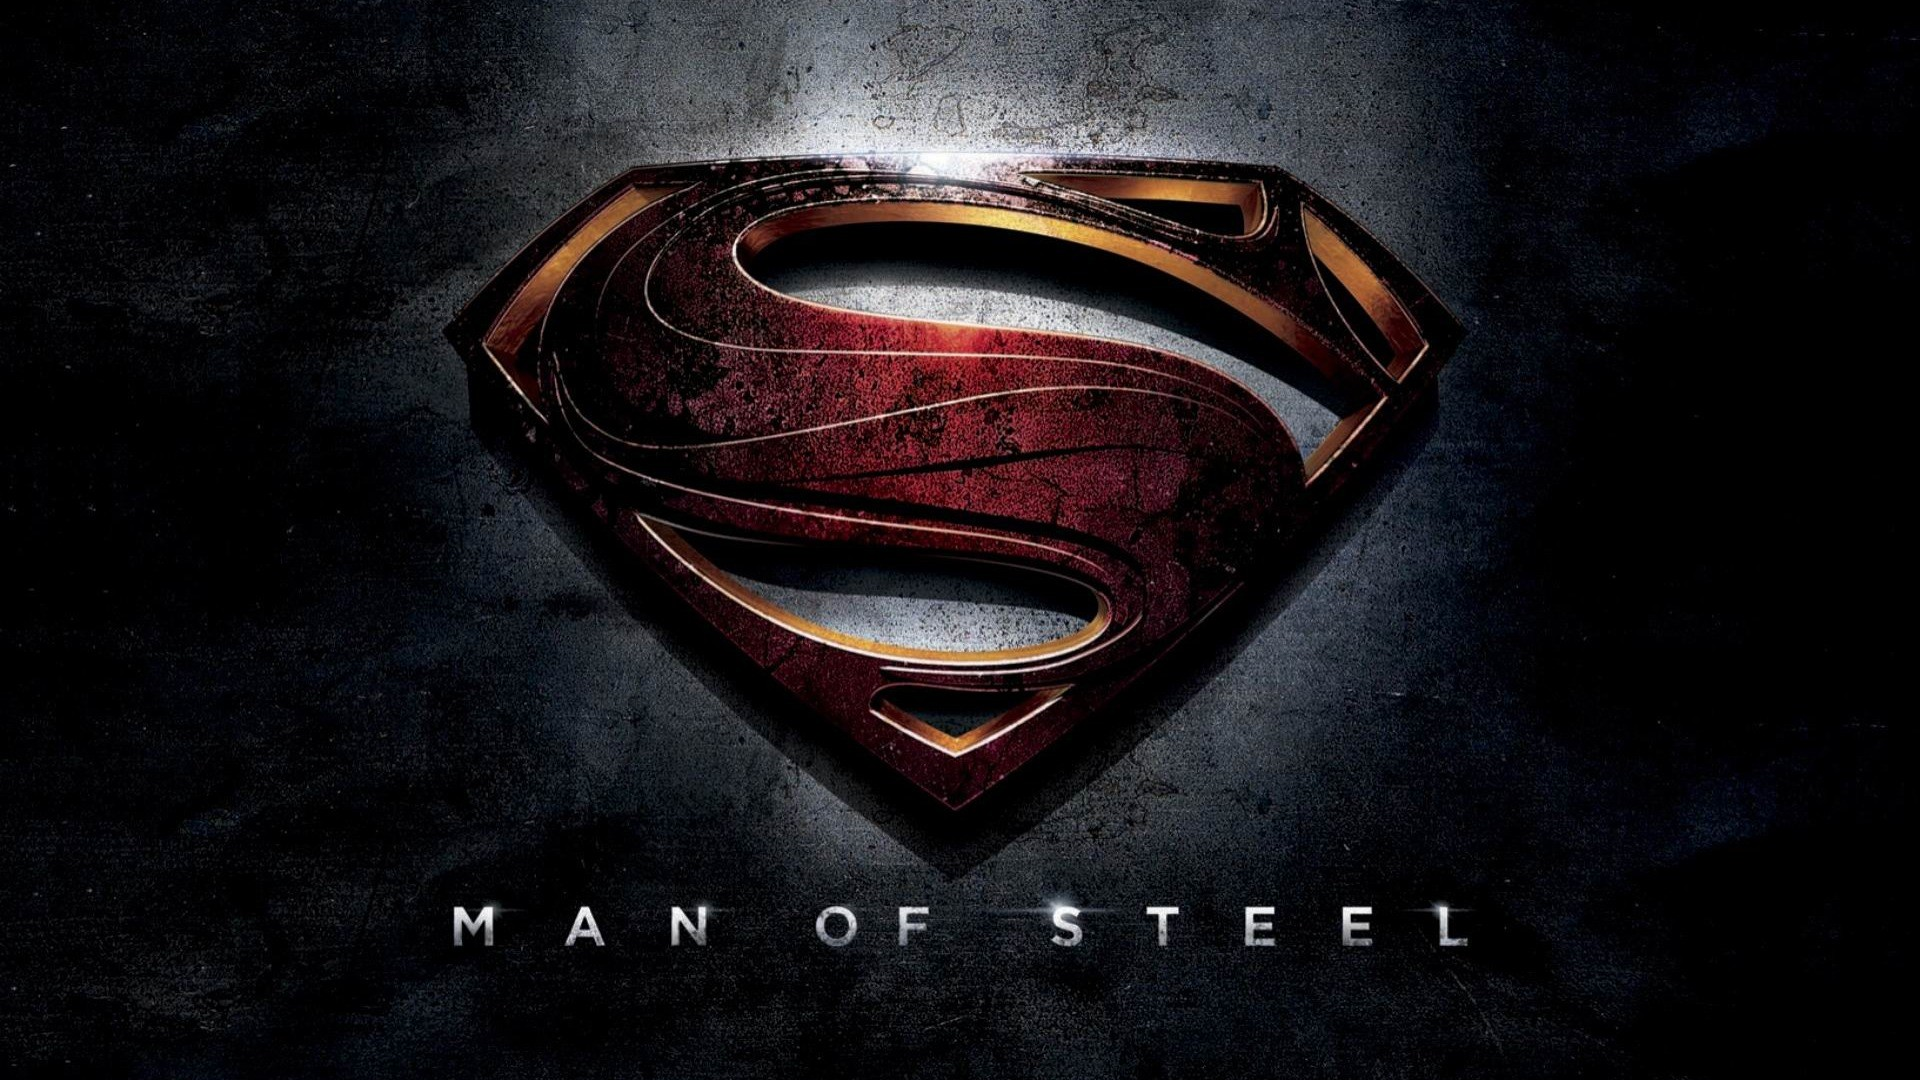 Superman Logo HD Wallpapers 1080p (60+